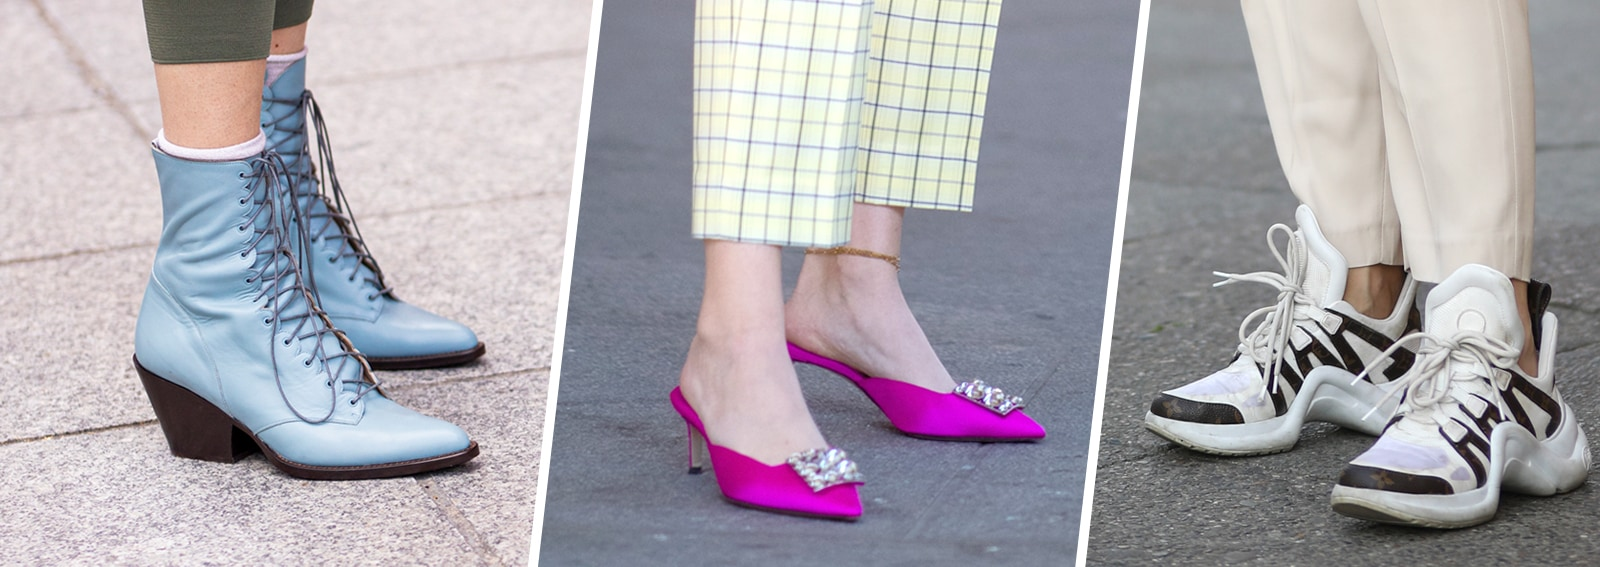 DESKTOP_scarpe_must_have_autunno